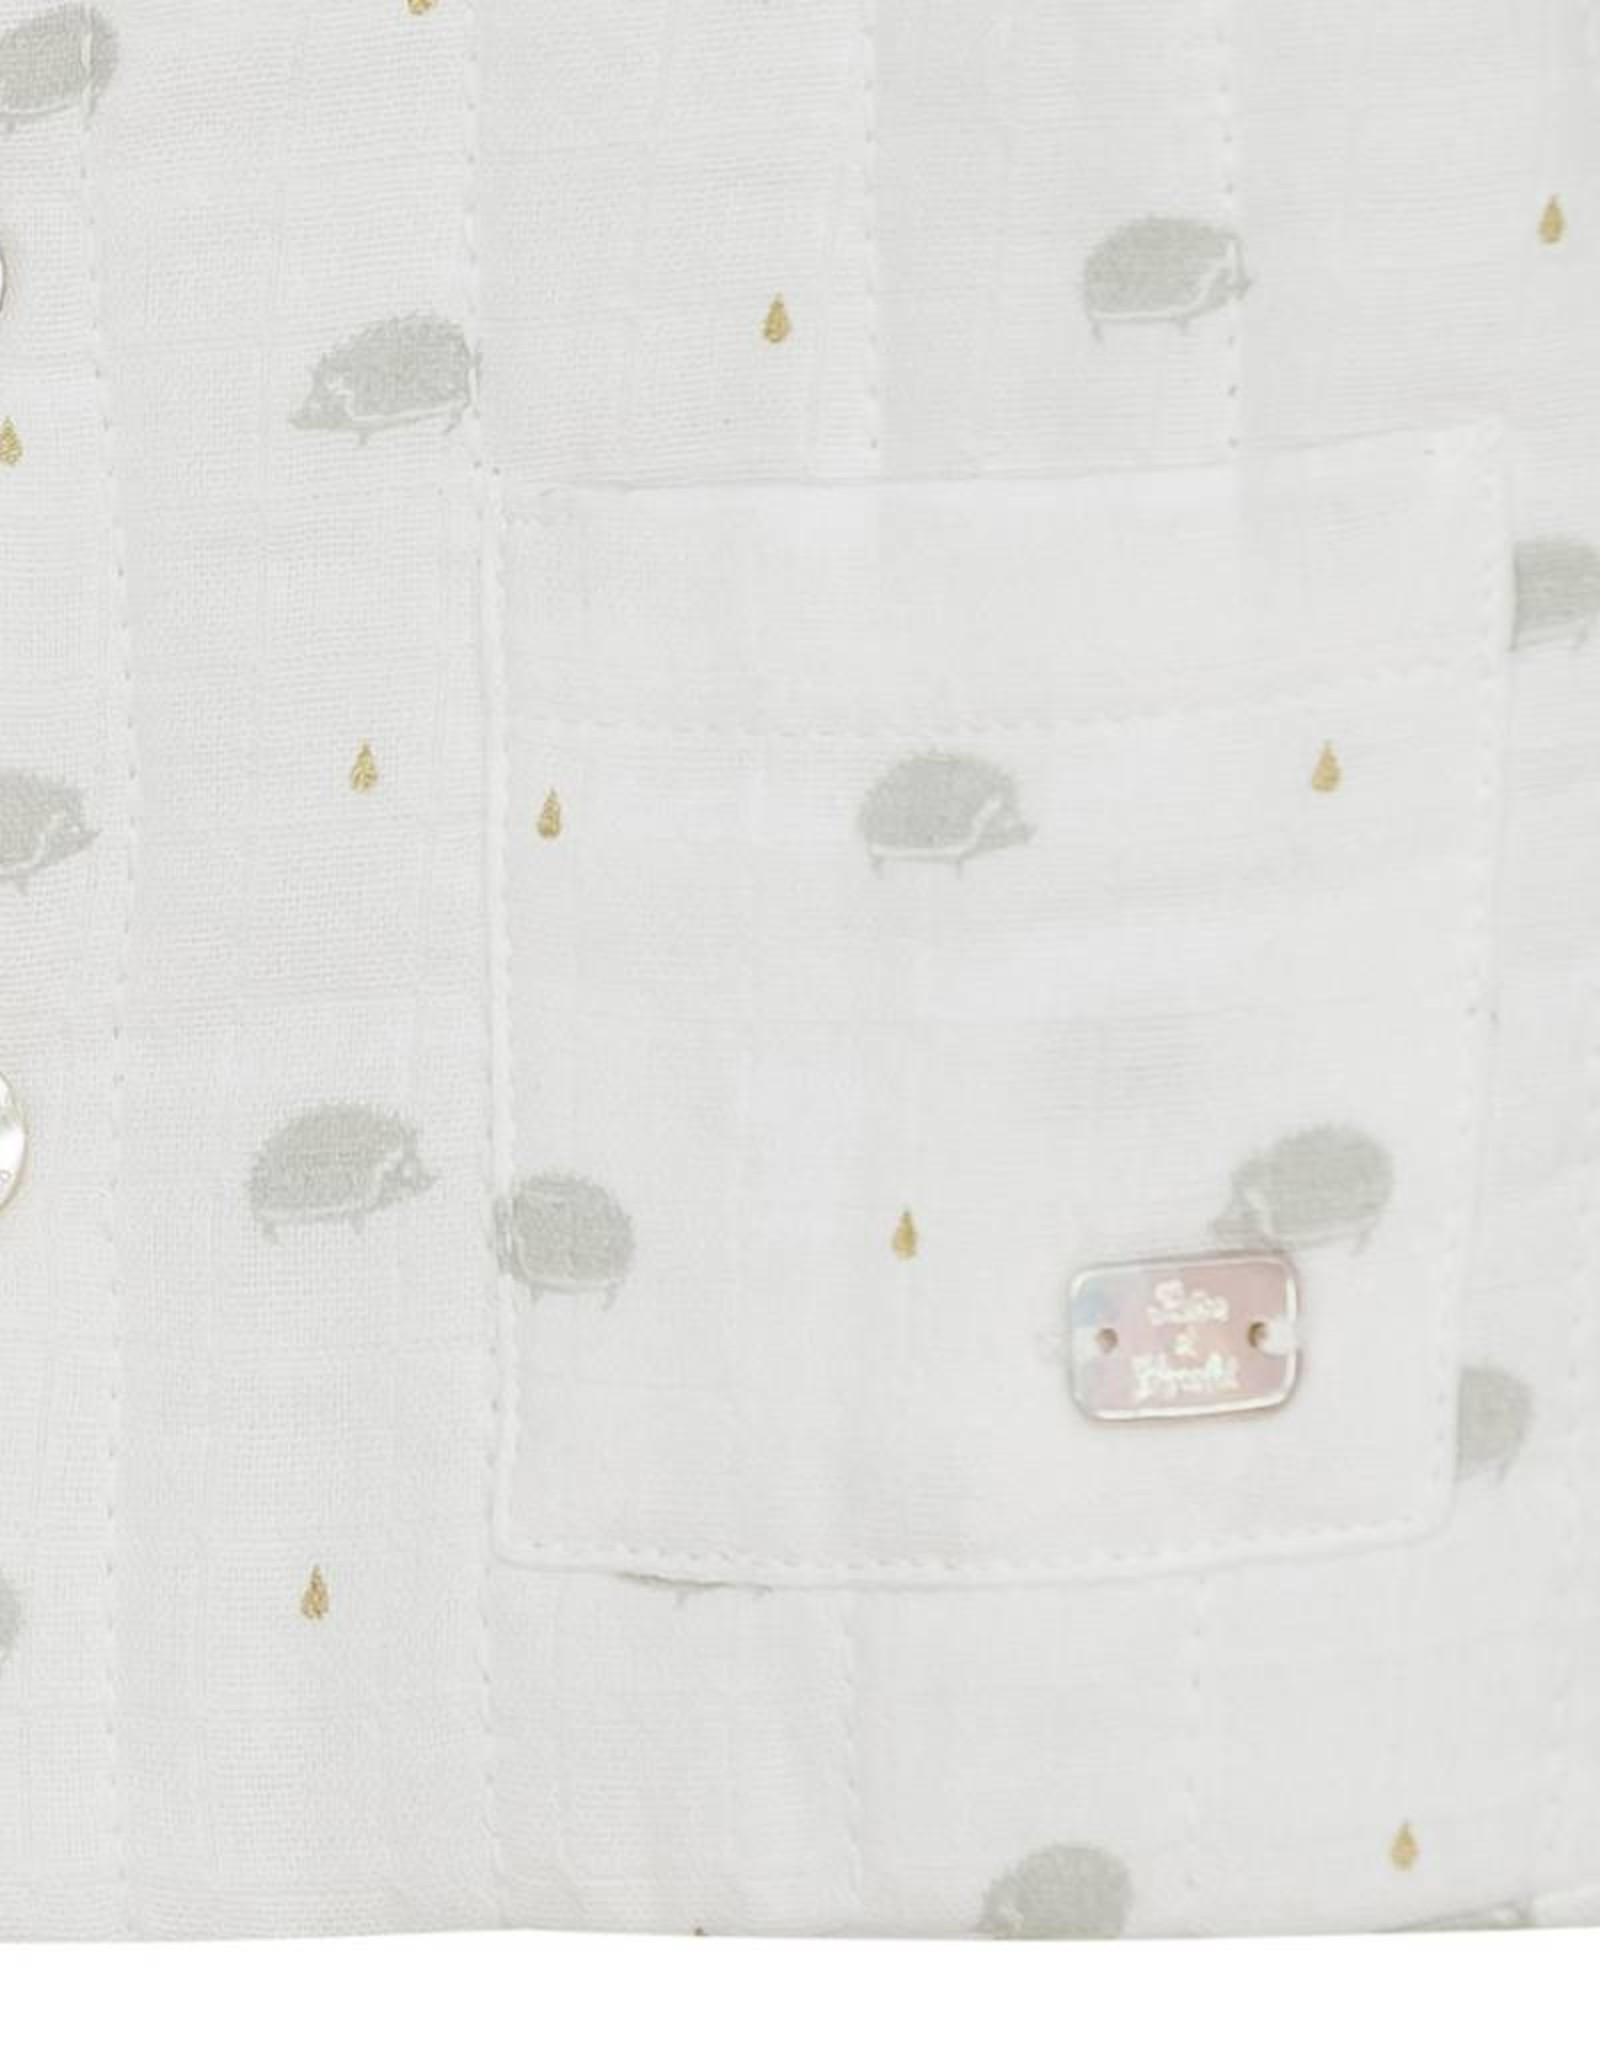 Tartine et Chocolat Jacket, hedgehogs print